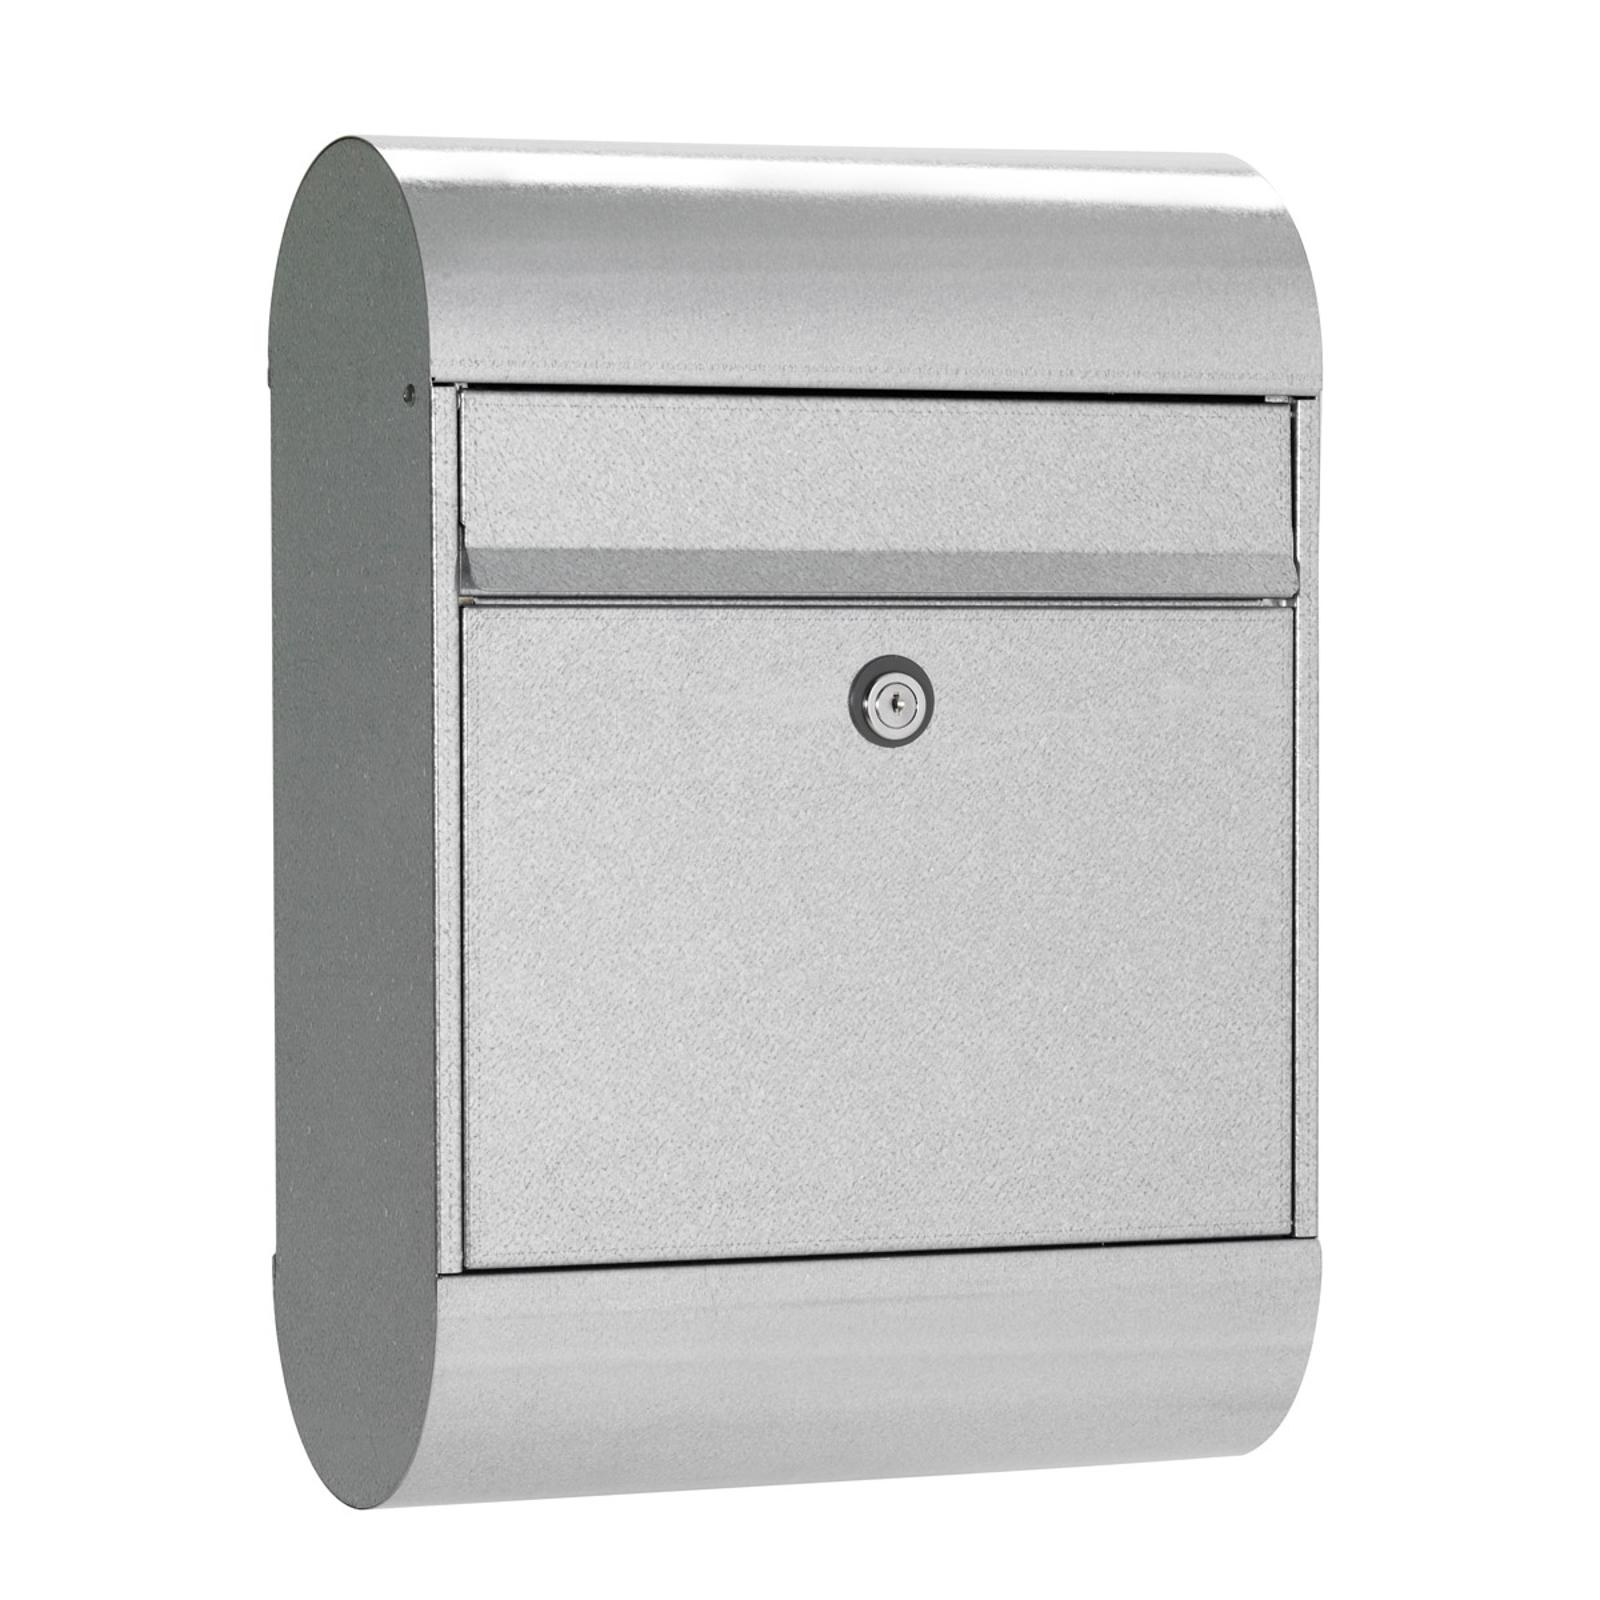 Scandinavian letterbox 6000_1045035_1